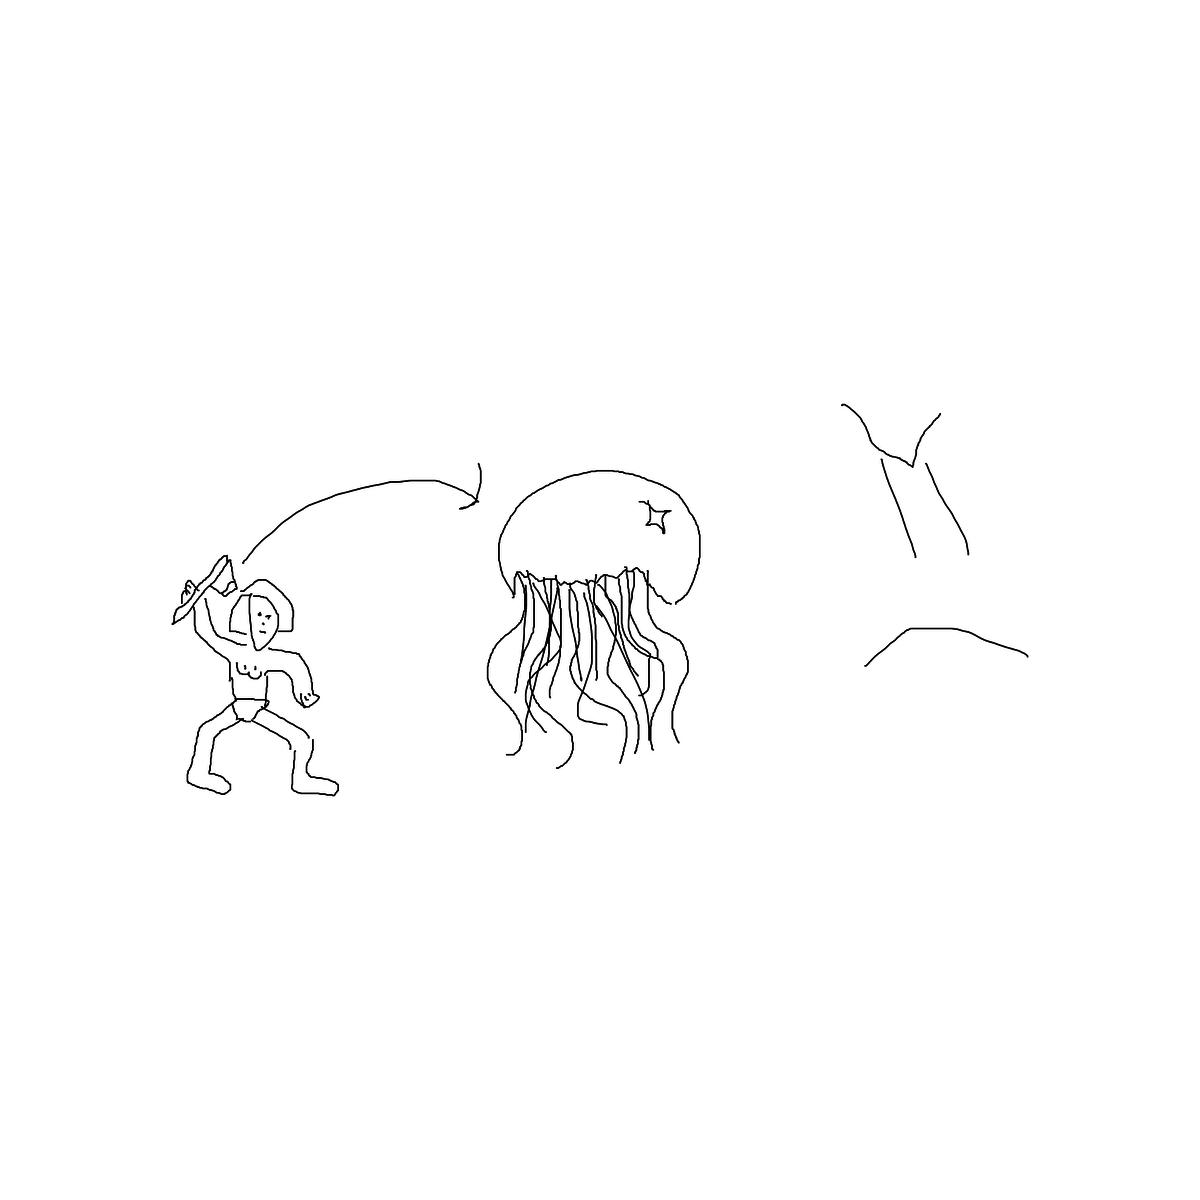 BAAAM drawing#678 lat:51.3456001281738300lng: 5.4248223304748535